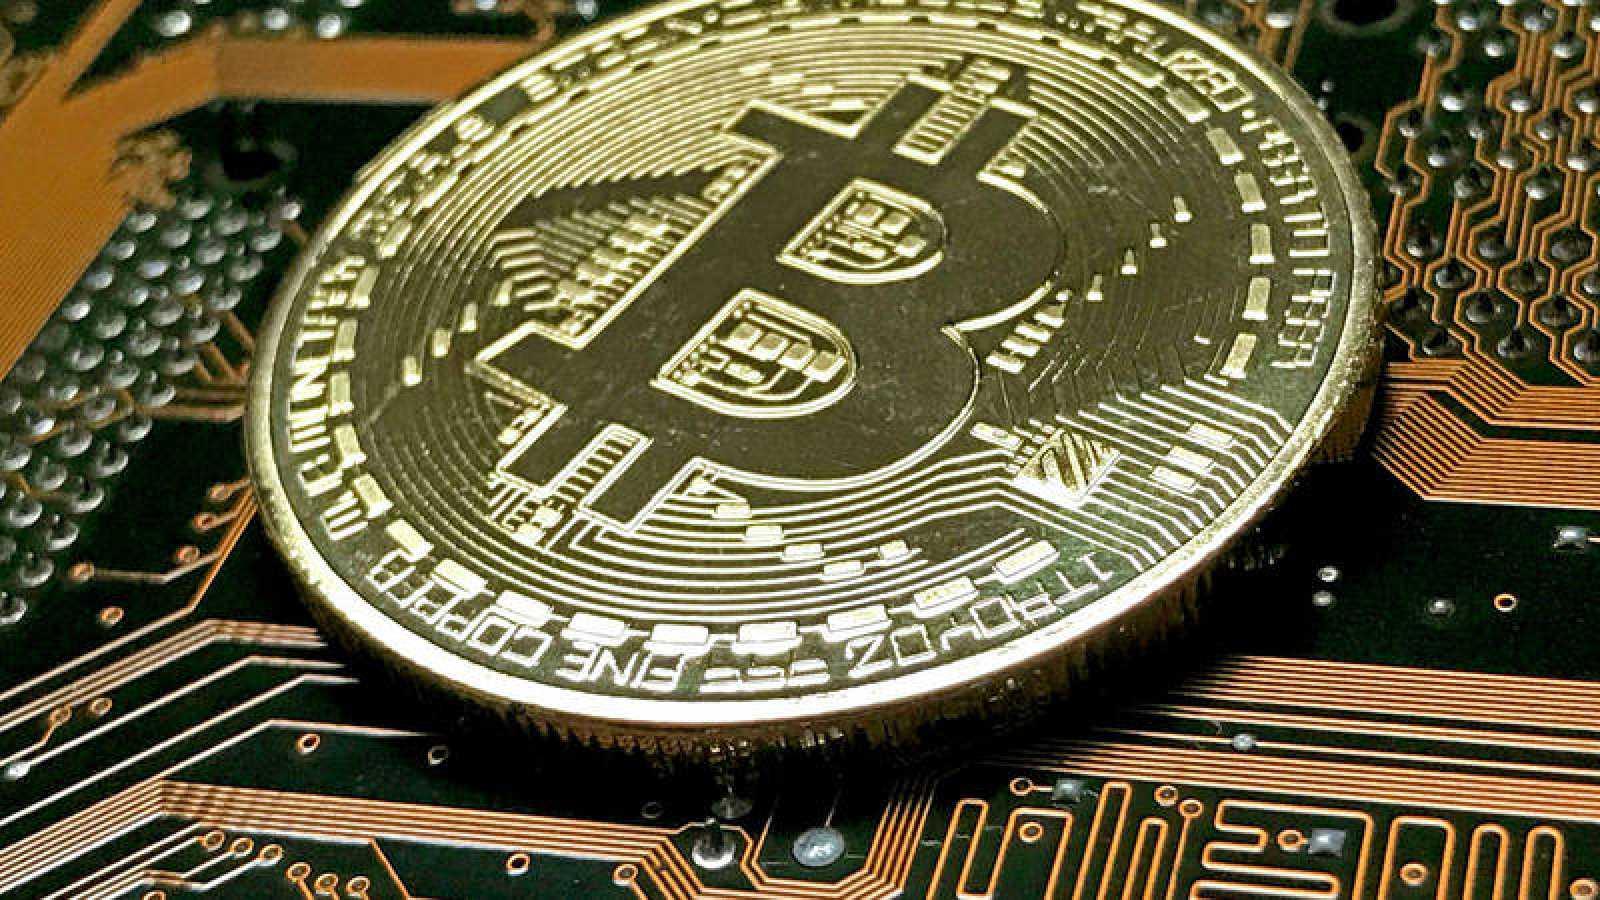 Vista de una moneda simbólica de bitcoin